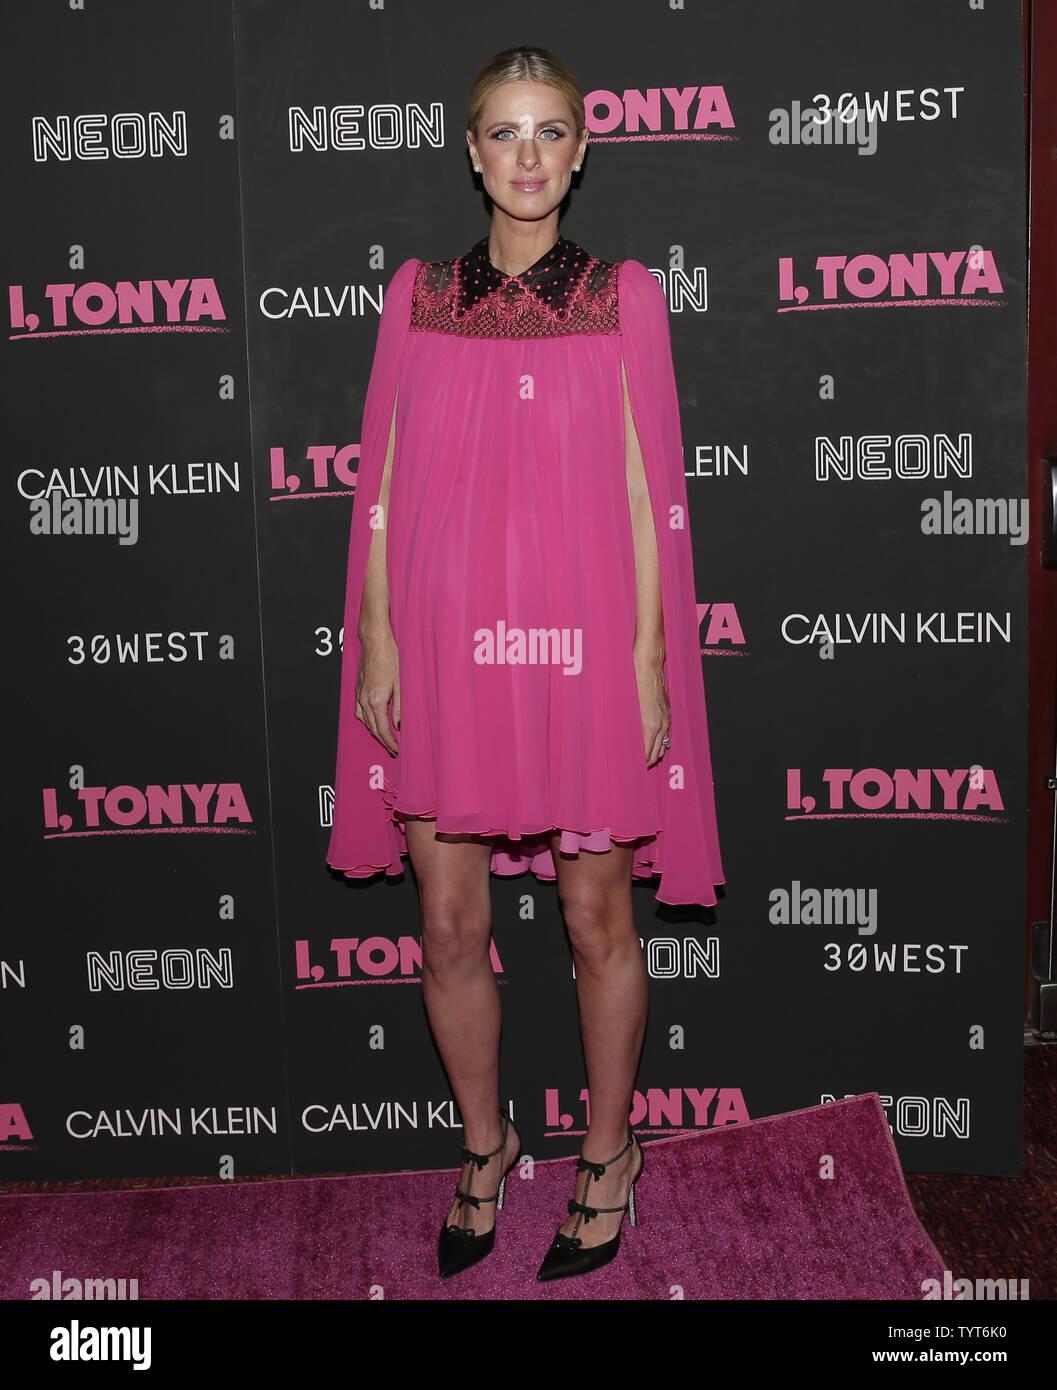 Nicky Hilton Rothschild arrives on the red carpet at the 'I, Tonya' New York Premiere at Village East Cinema on November 28, 2017 in New York City.    Photo by John Angelillo/UPI - Stock Image